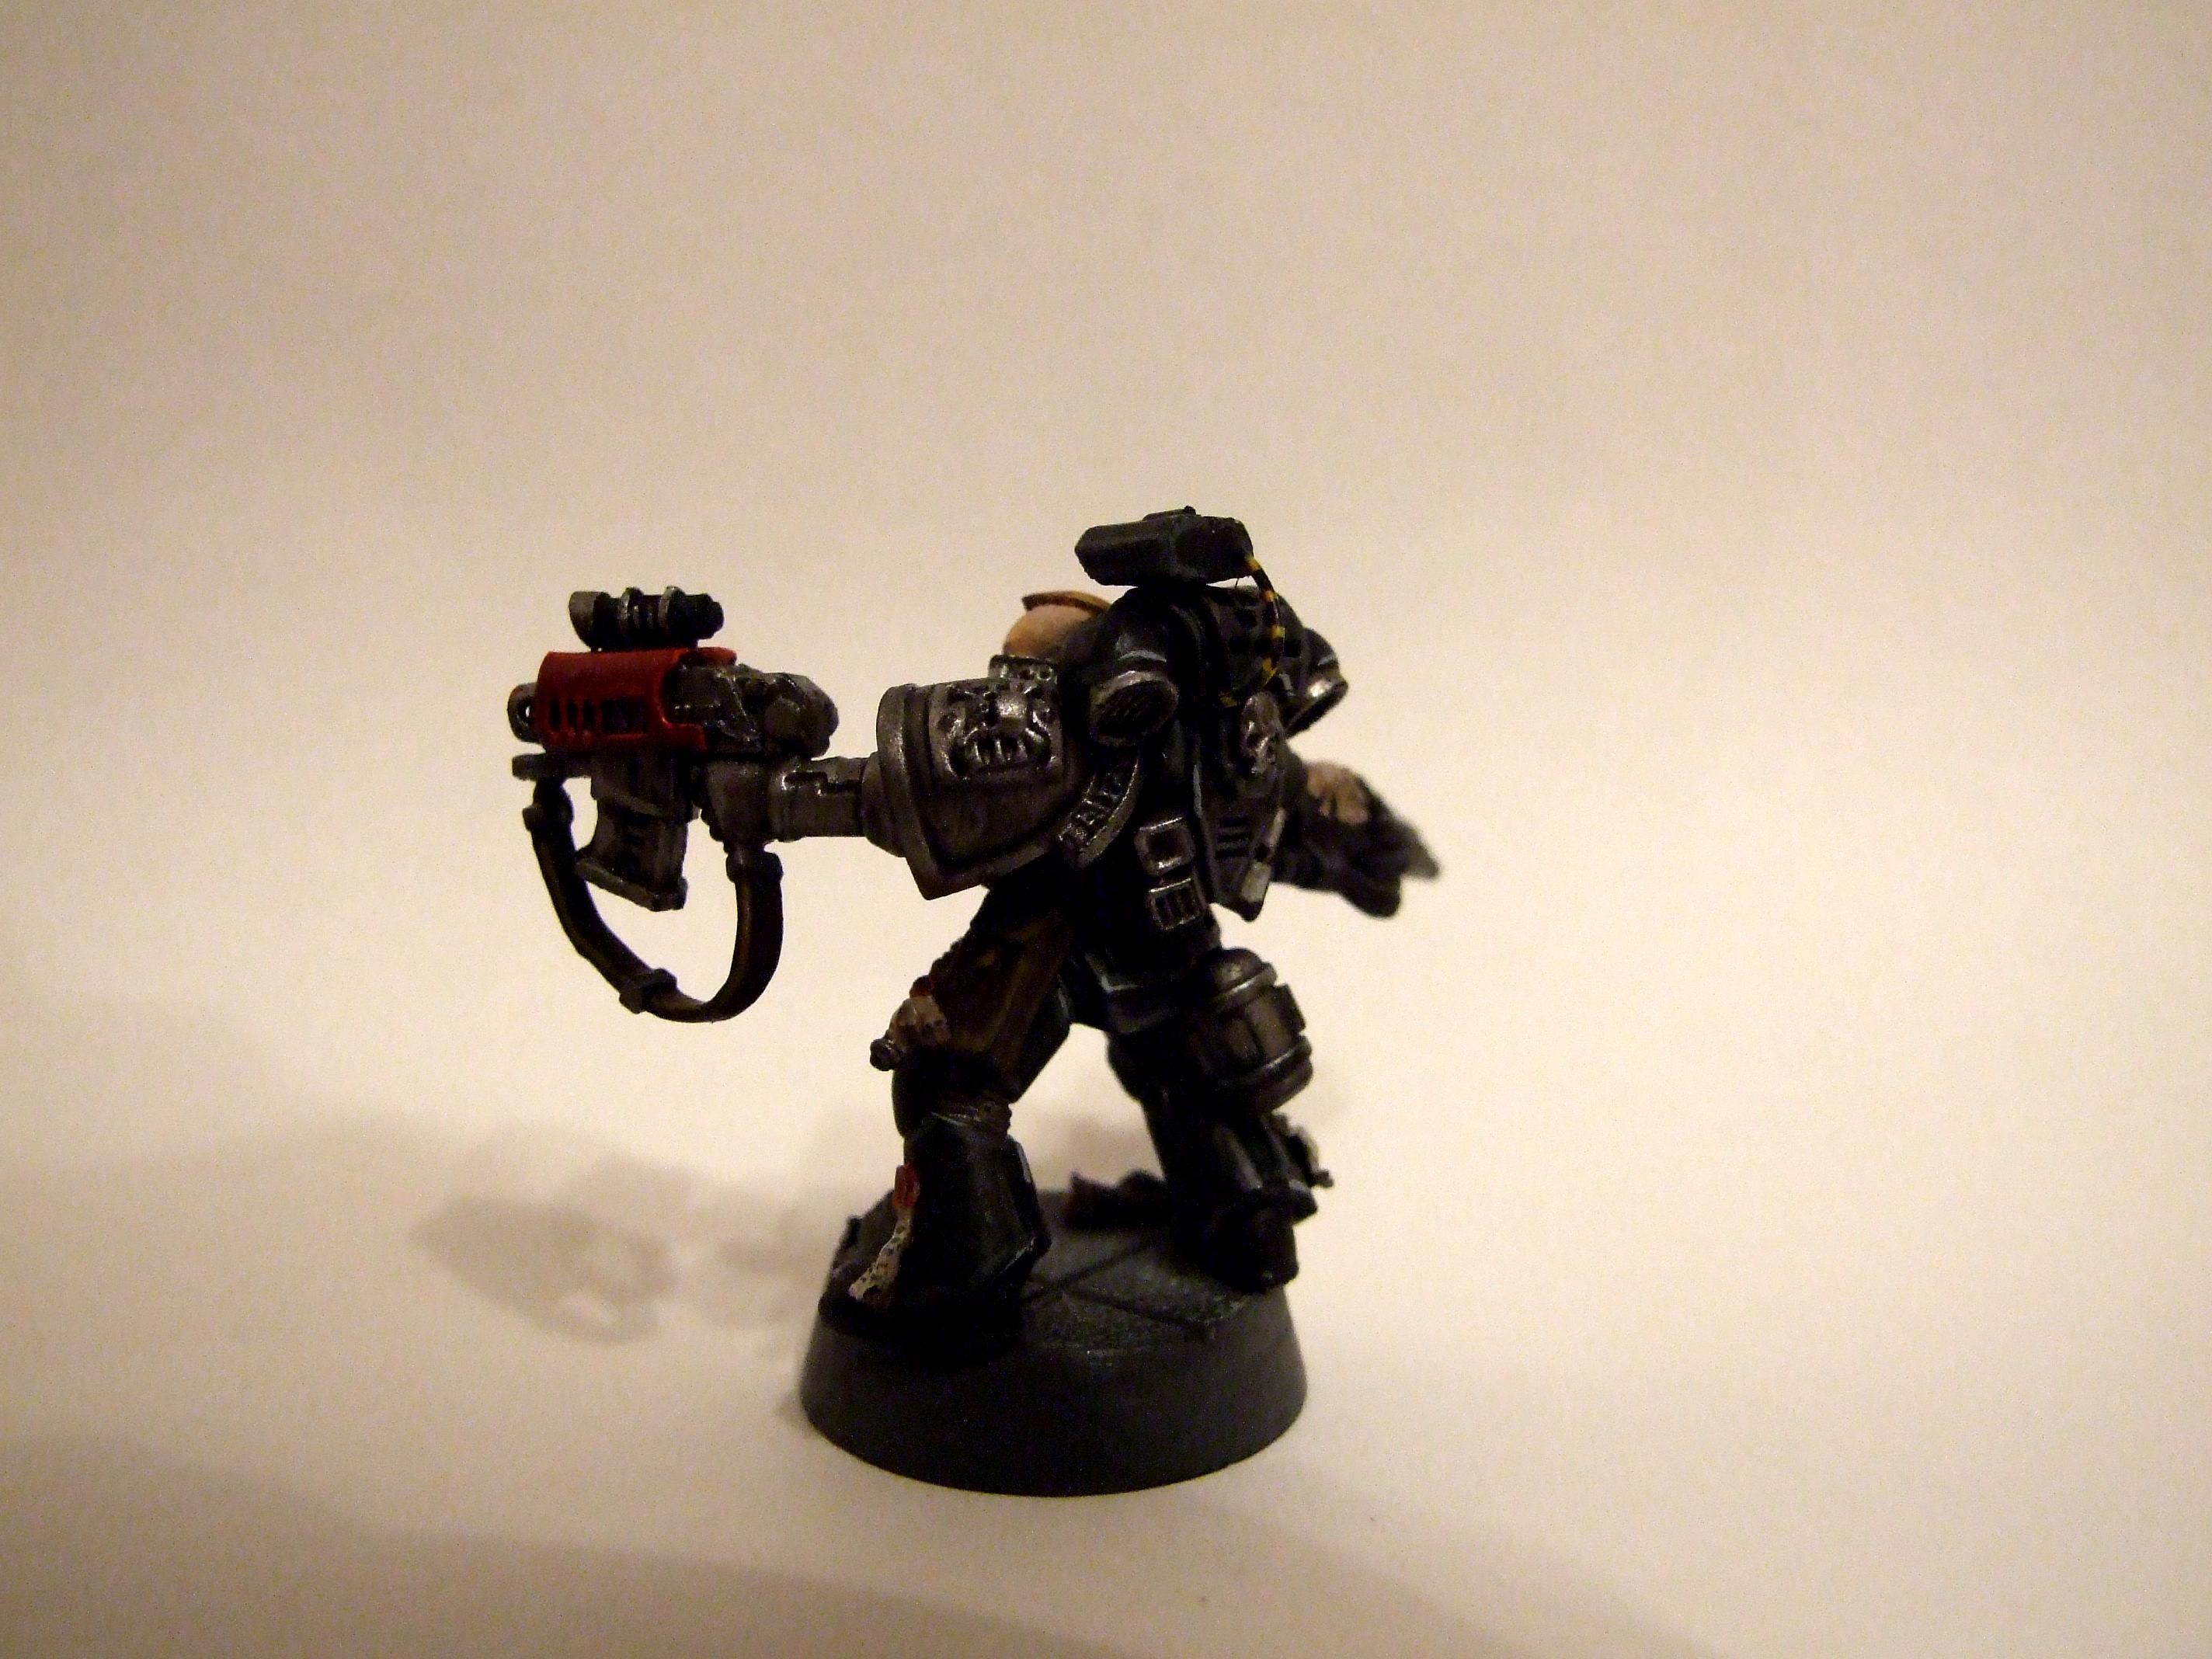 40k Imperial, Deathwatch, Kill Team, Lightening Claw, Ordus Xenos, Sergeant, Space Marines, Storm Bolter, Veteran